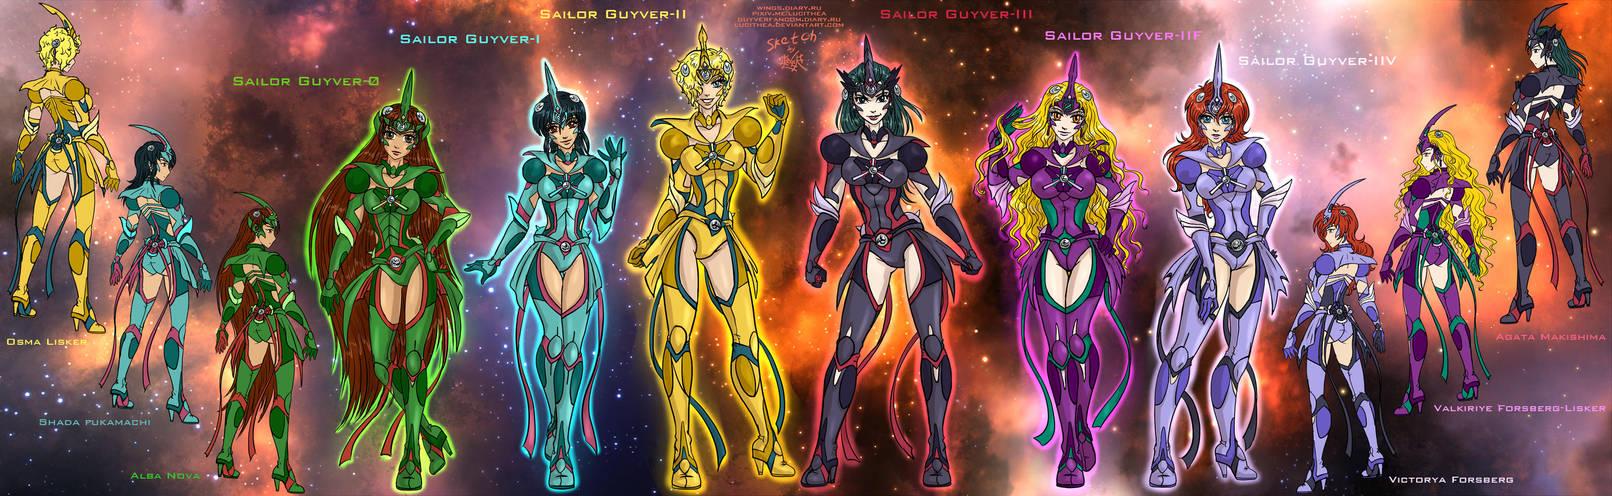 Sailor Guyvers by Lucithea